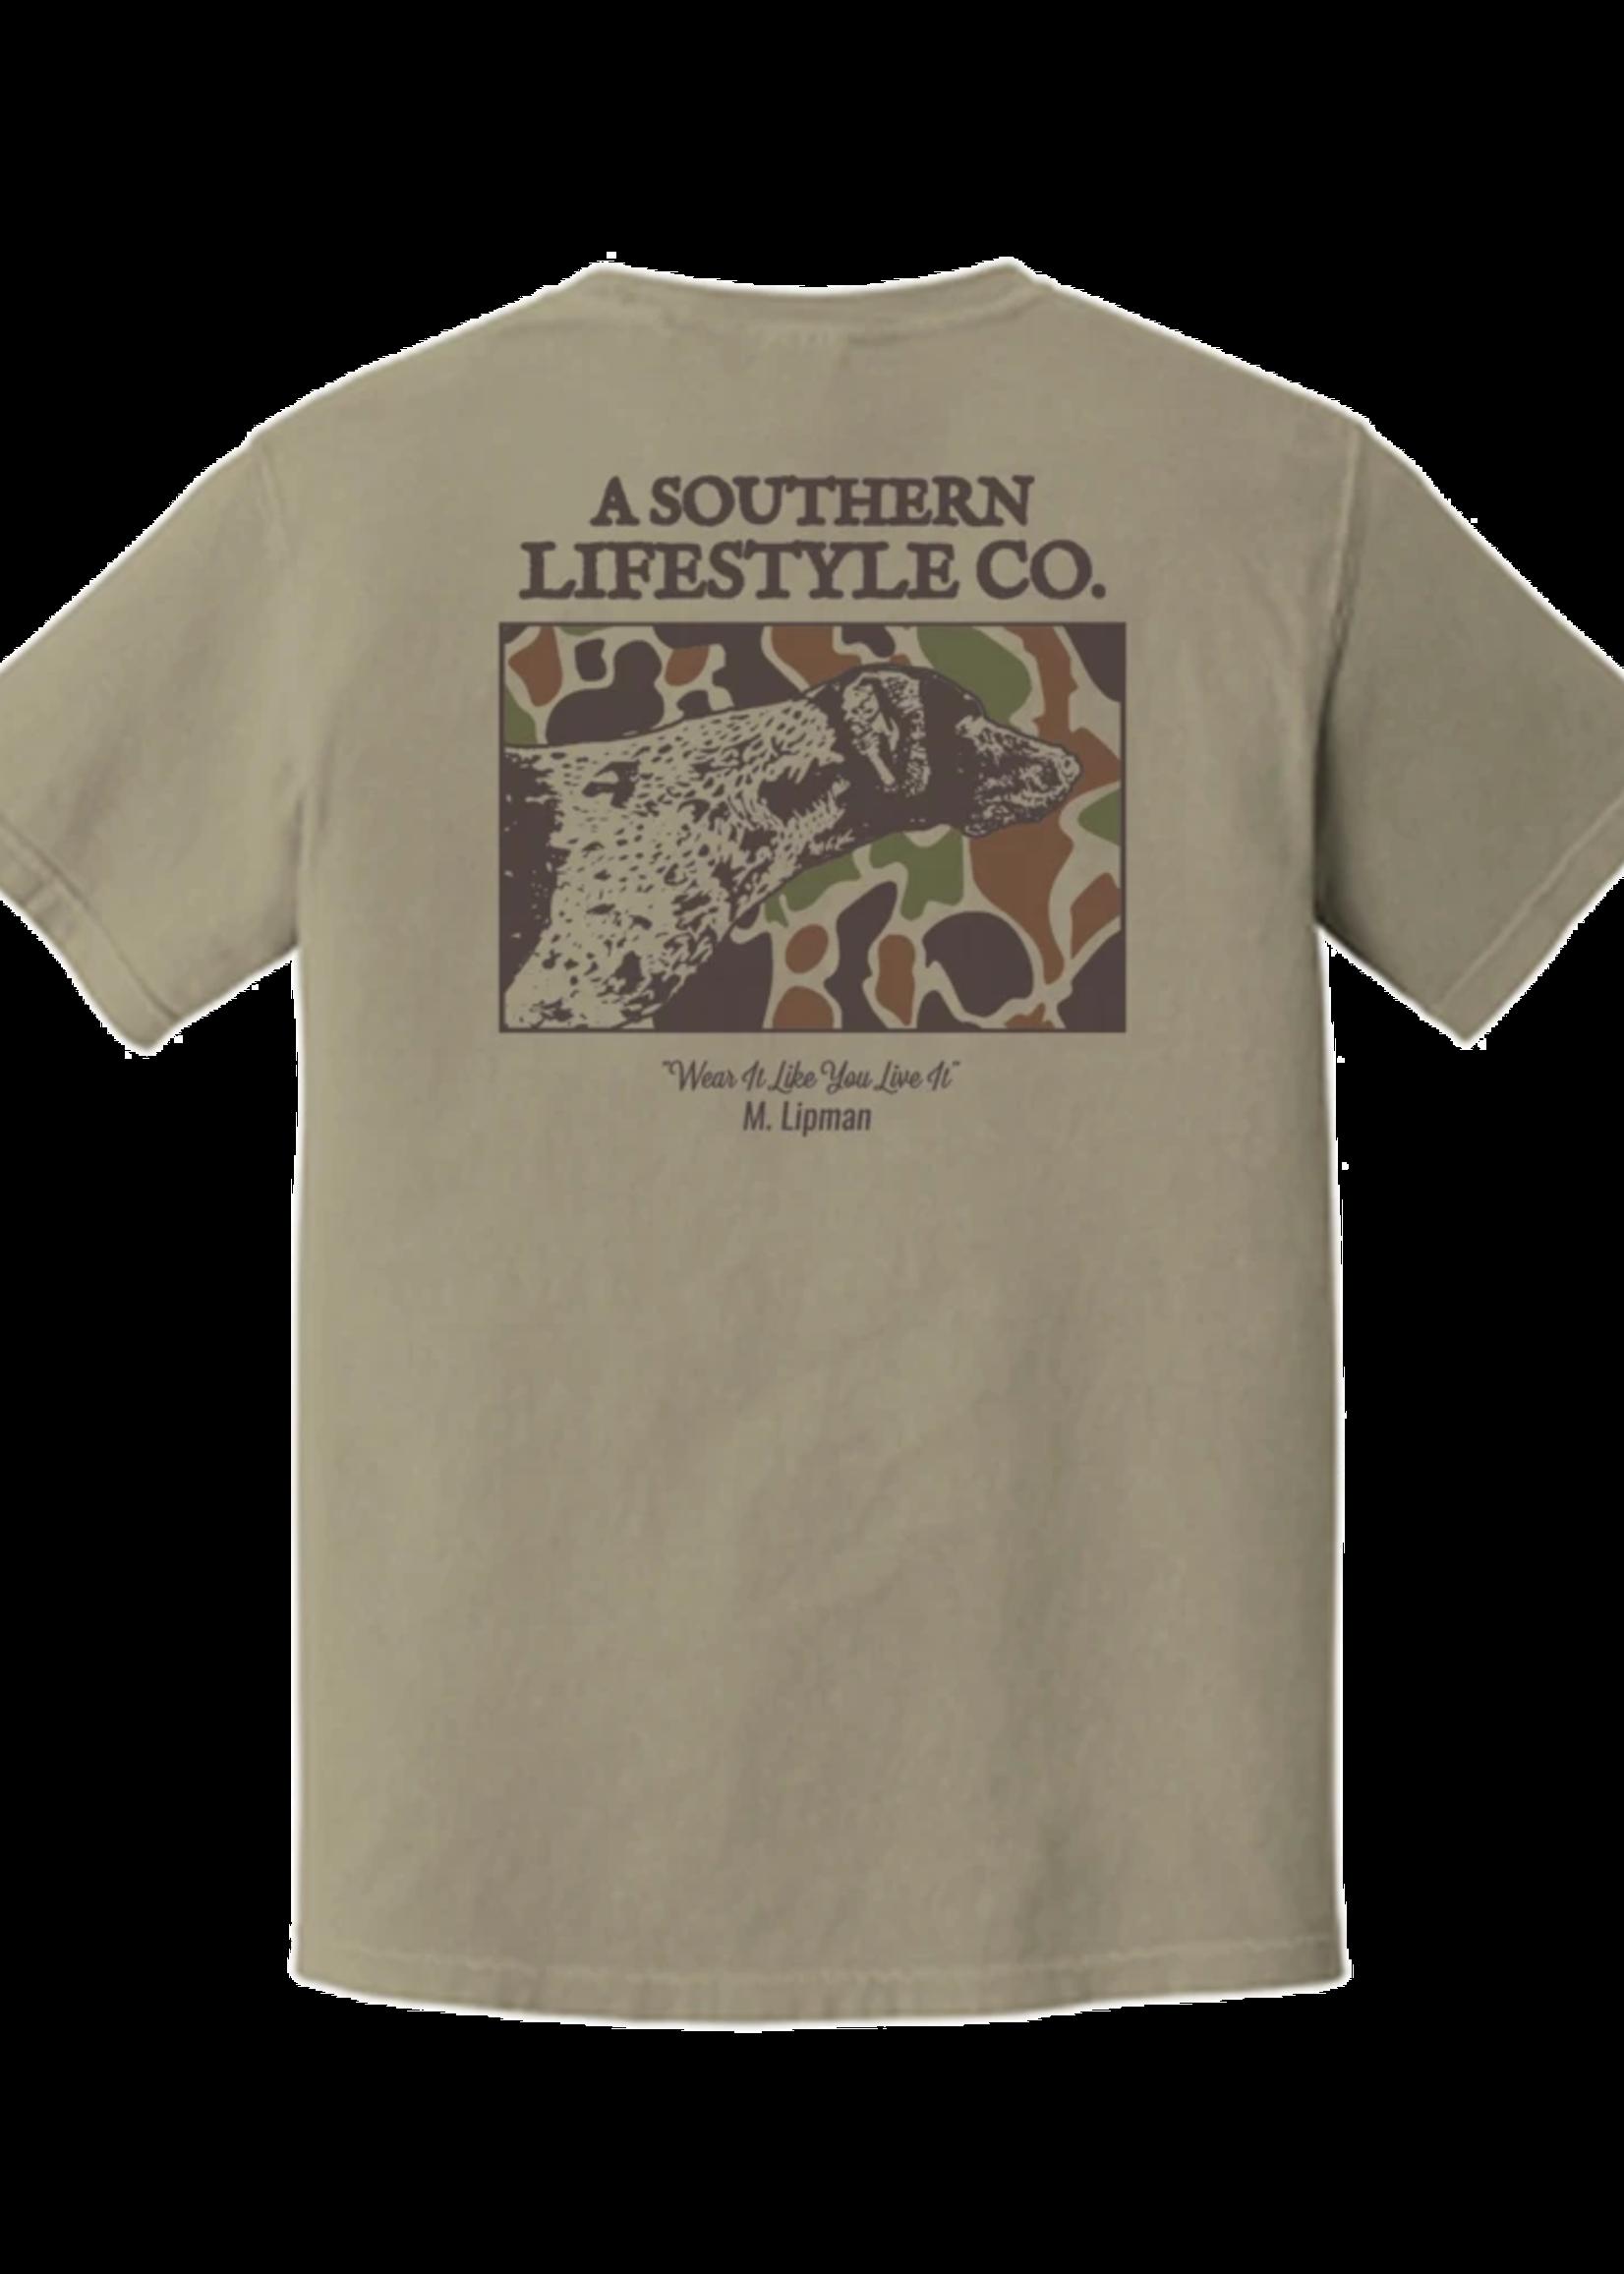 A Southern Lifestyle Co Camo Dog Tee